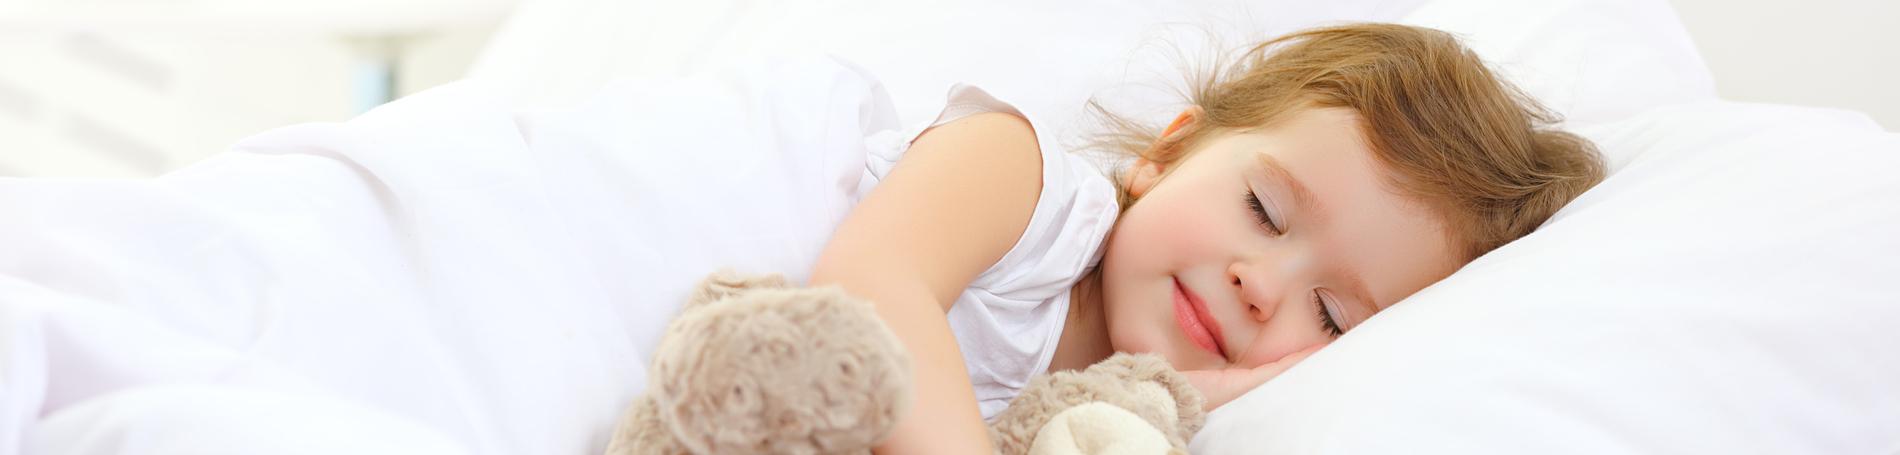 Little girl smiling in her sleep and cuddling her teddy bear